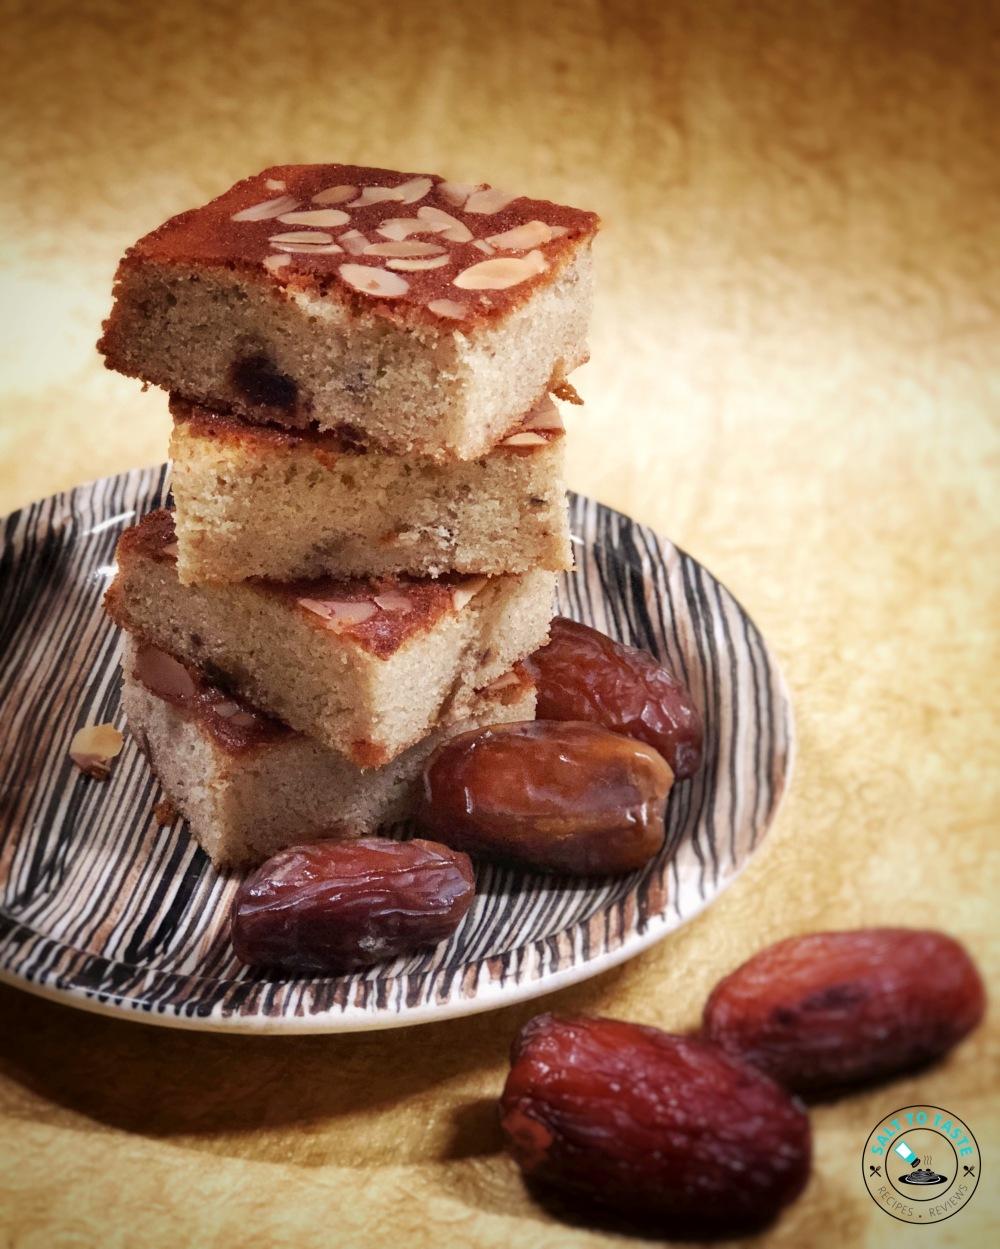 Almond date cake